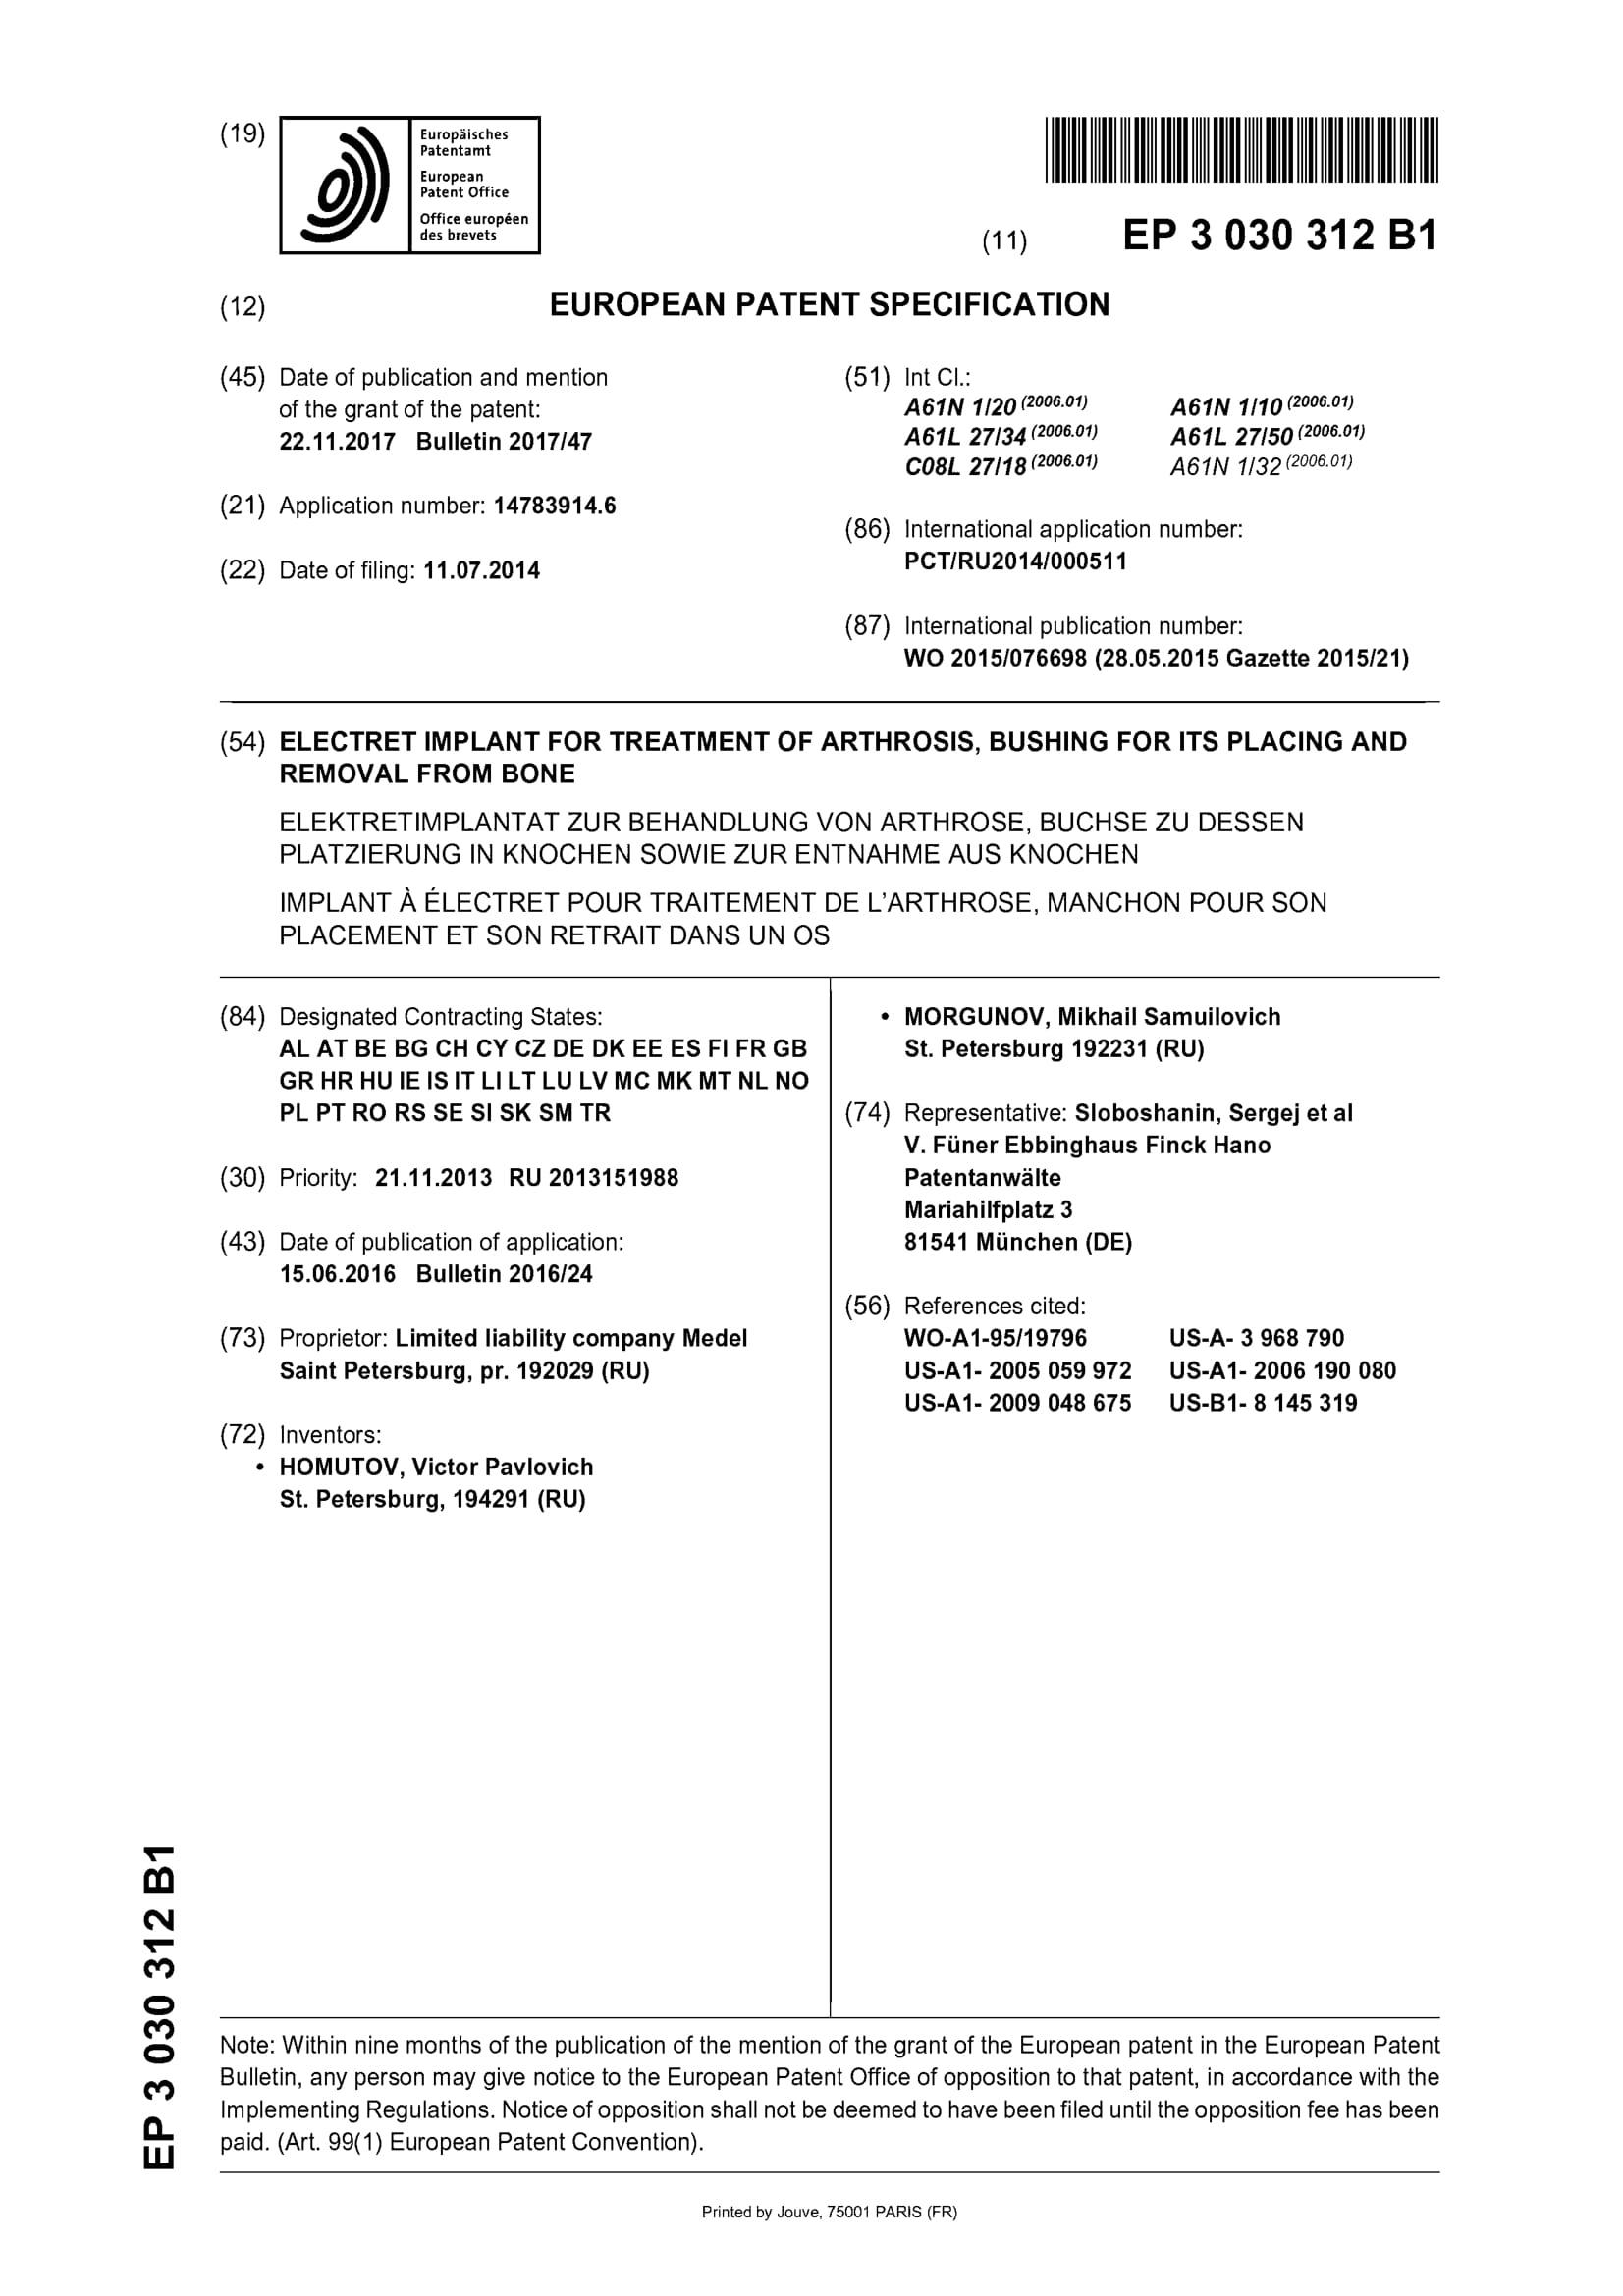 impleso-european-patent